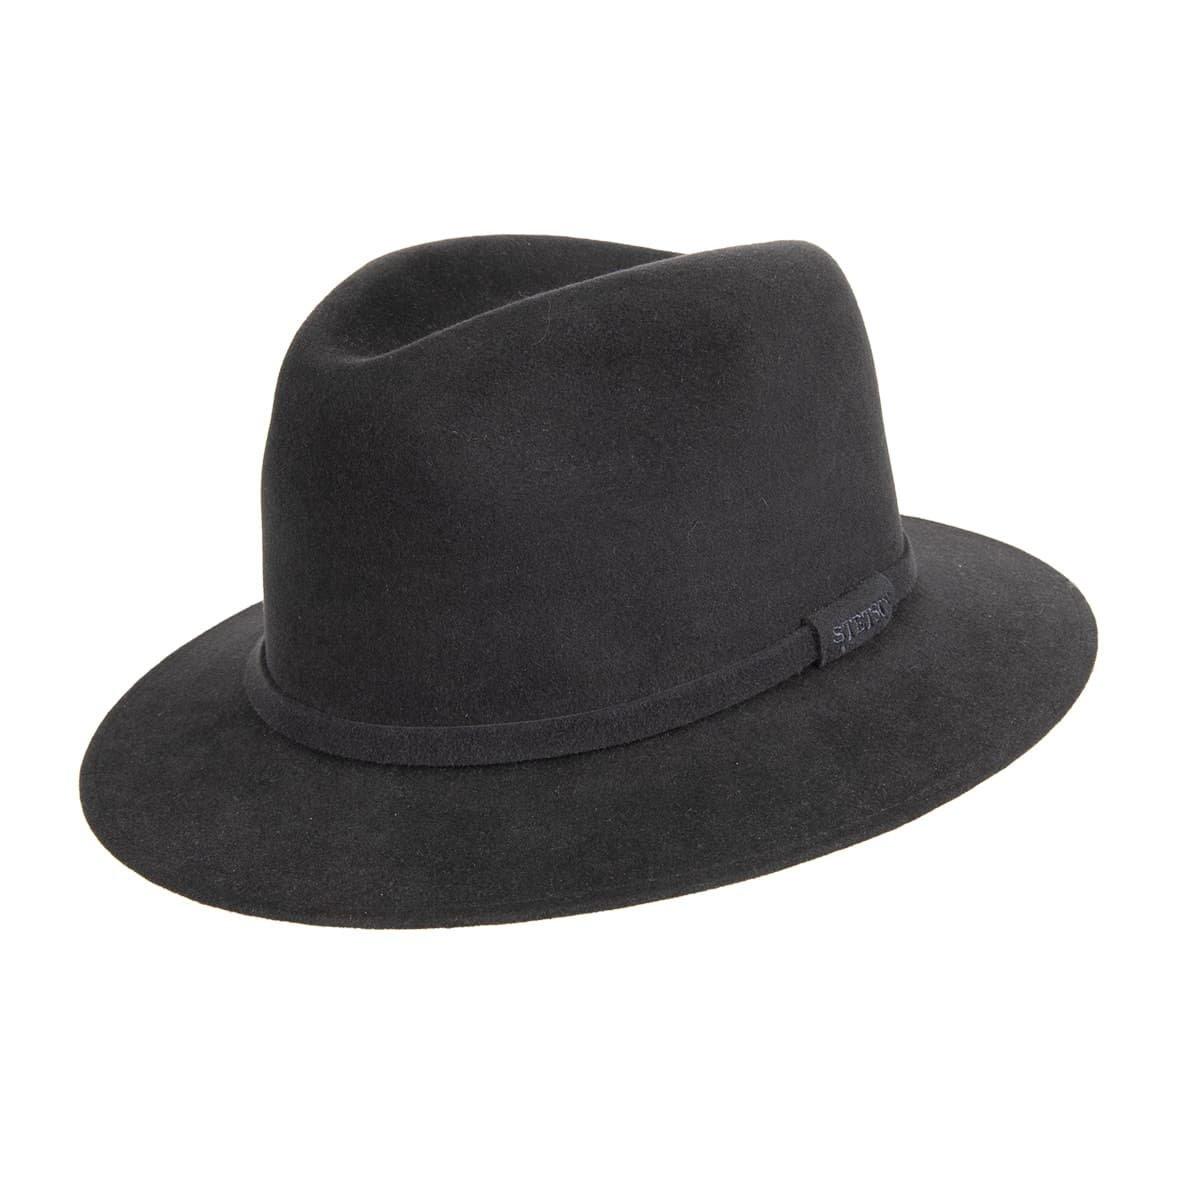 elegant hat by Stetson 6017f5e9816d